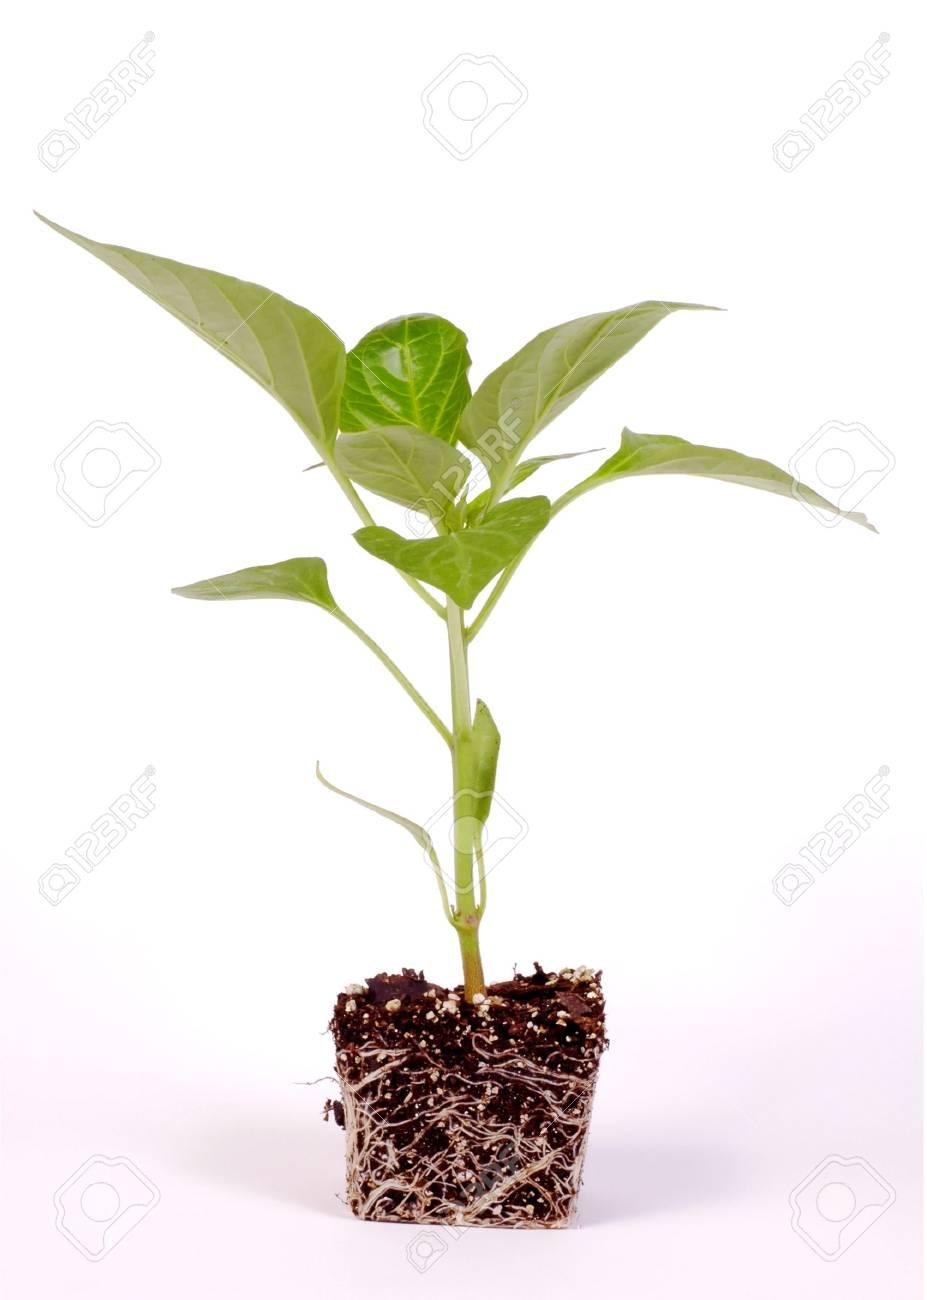 Pepper Plant on White Background - 890231